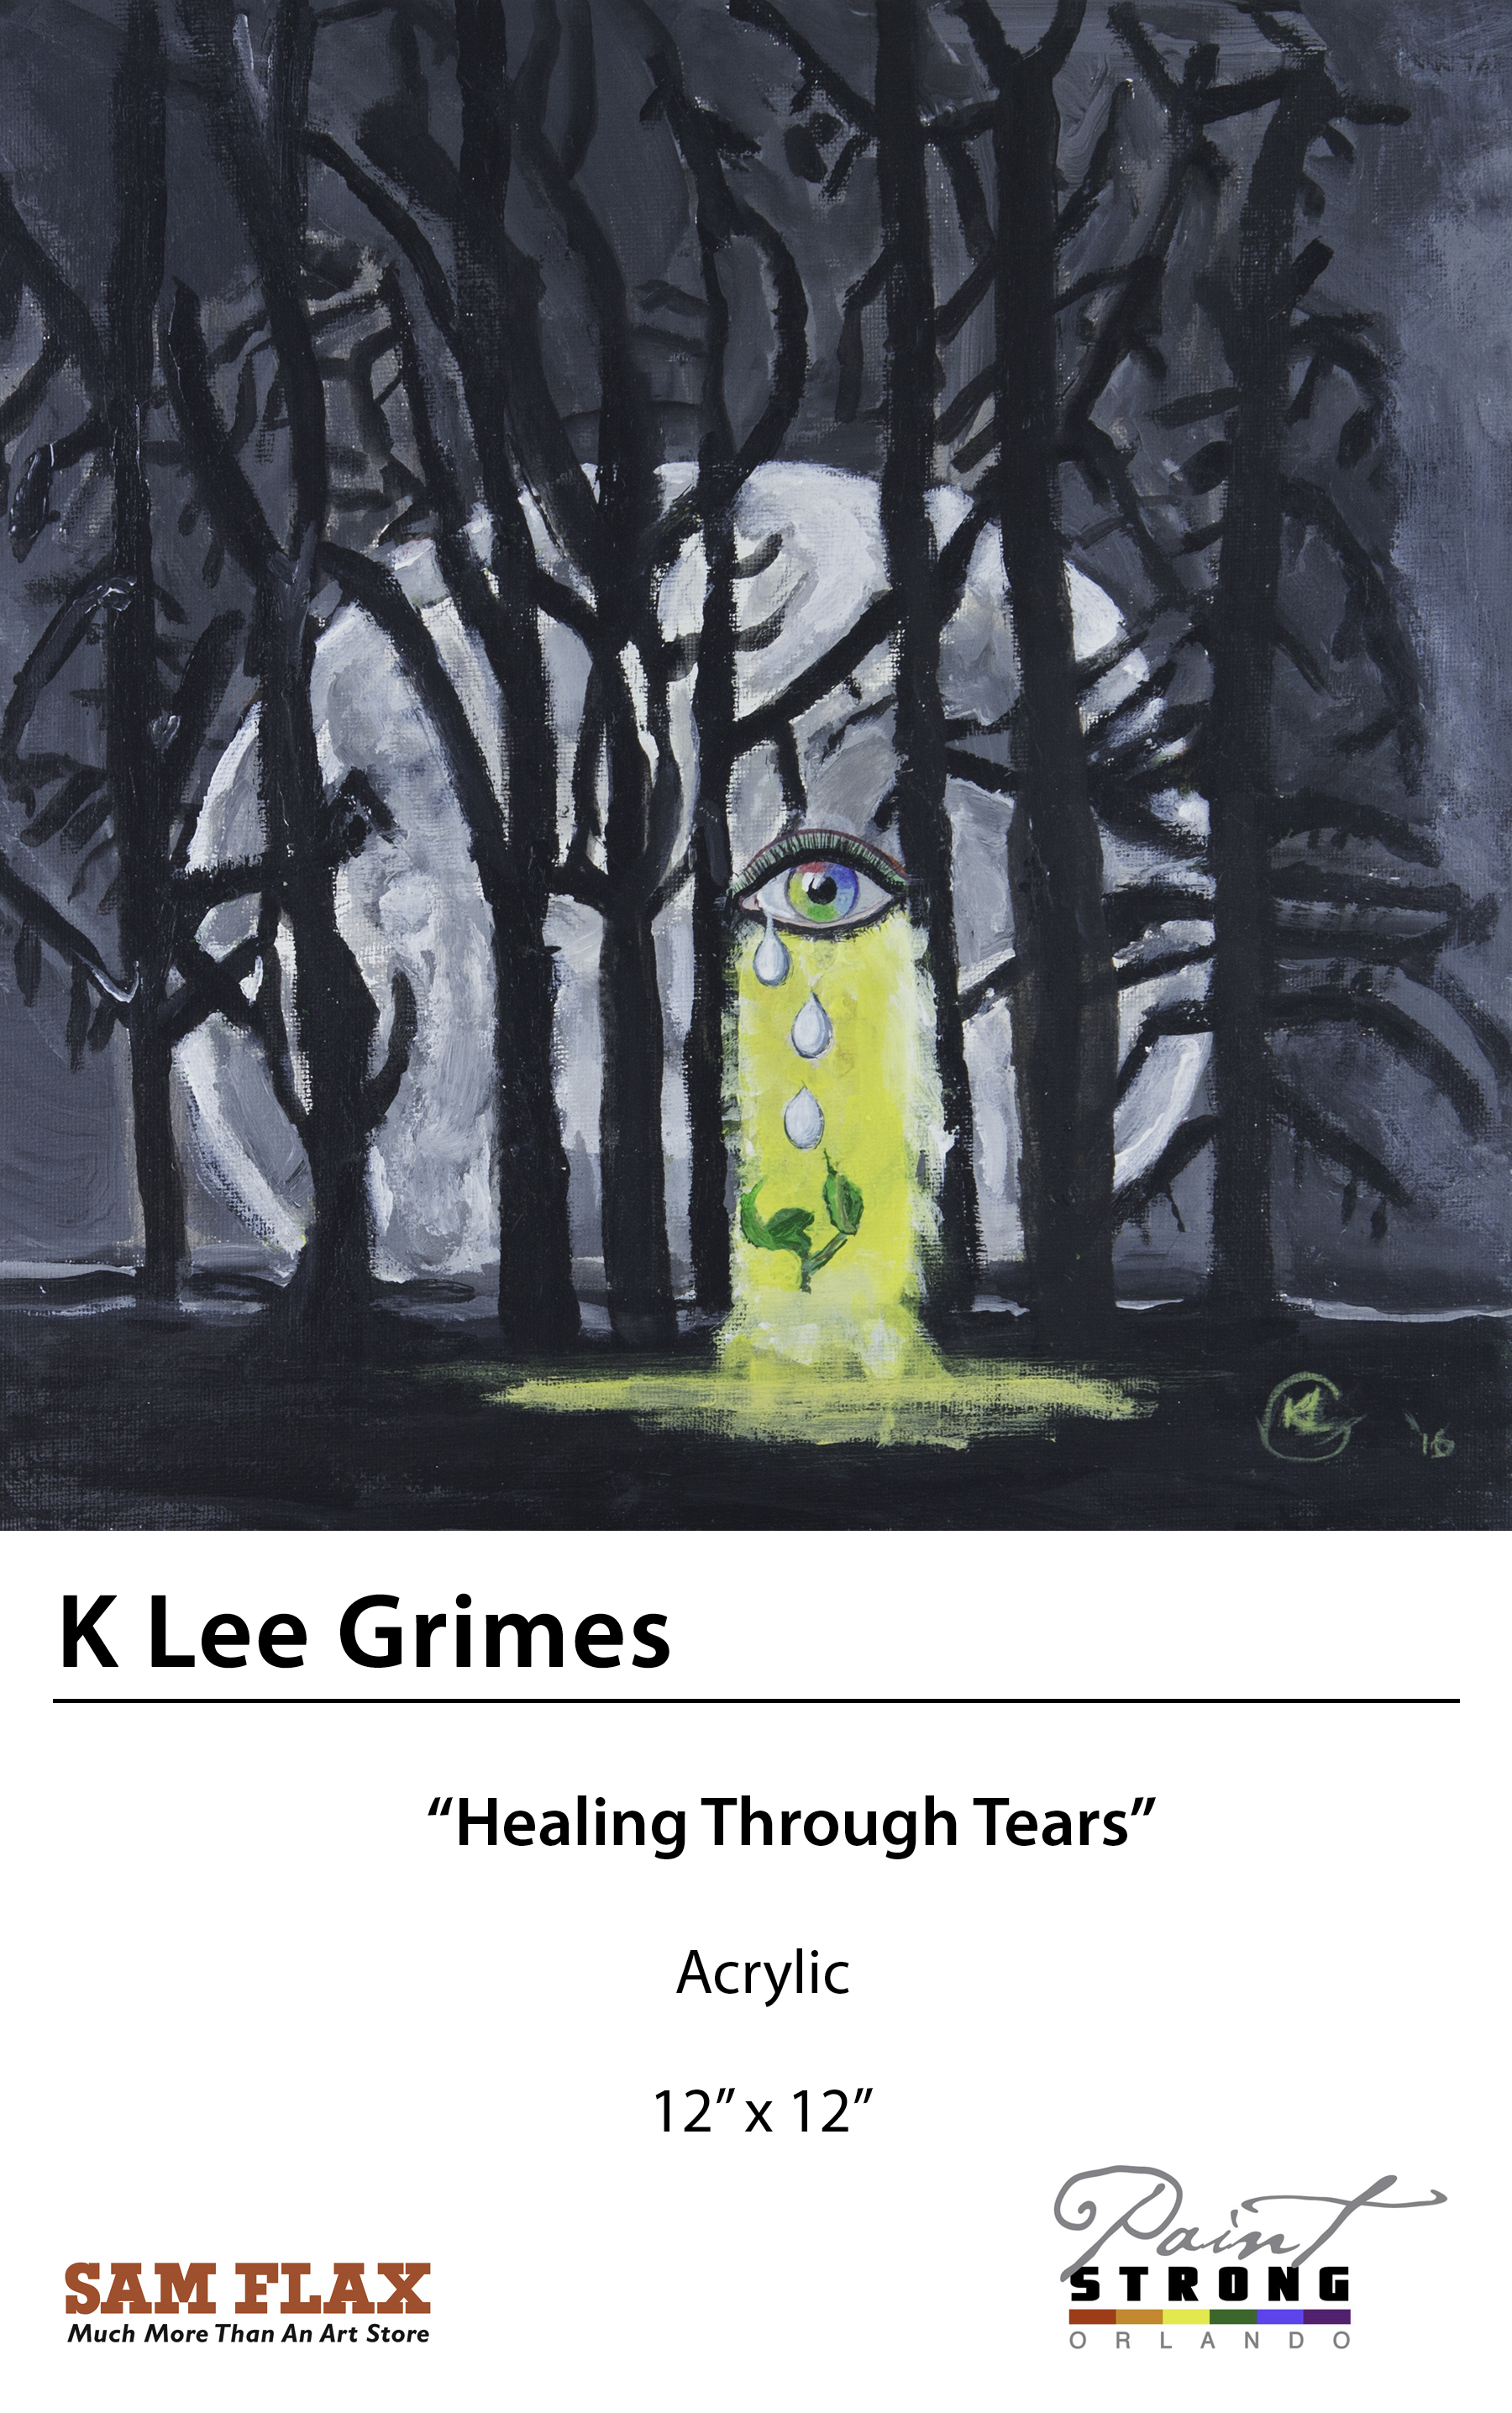 K Lee Grimes